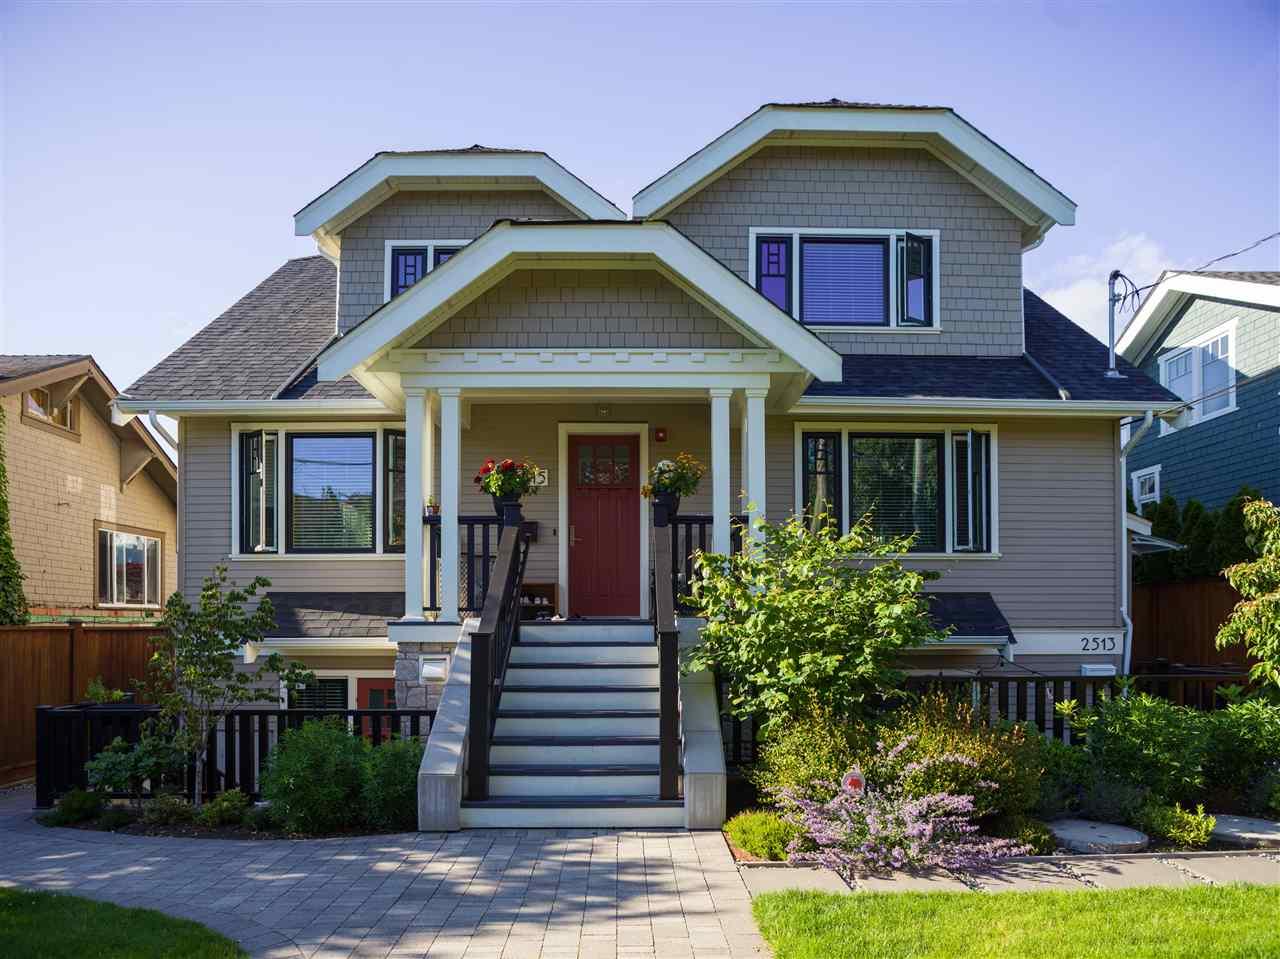 2519 W 8TH AVENUE, Vancouver West